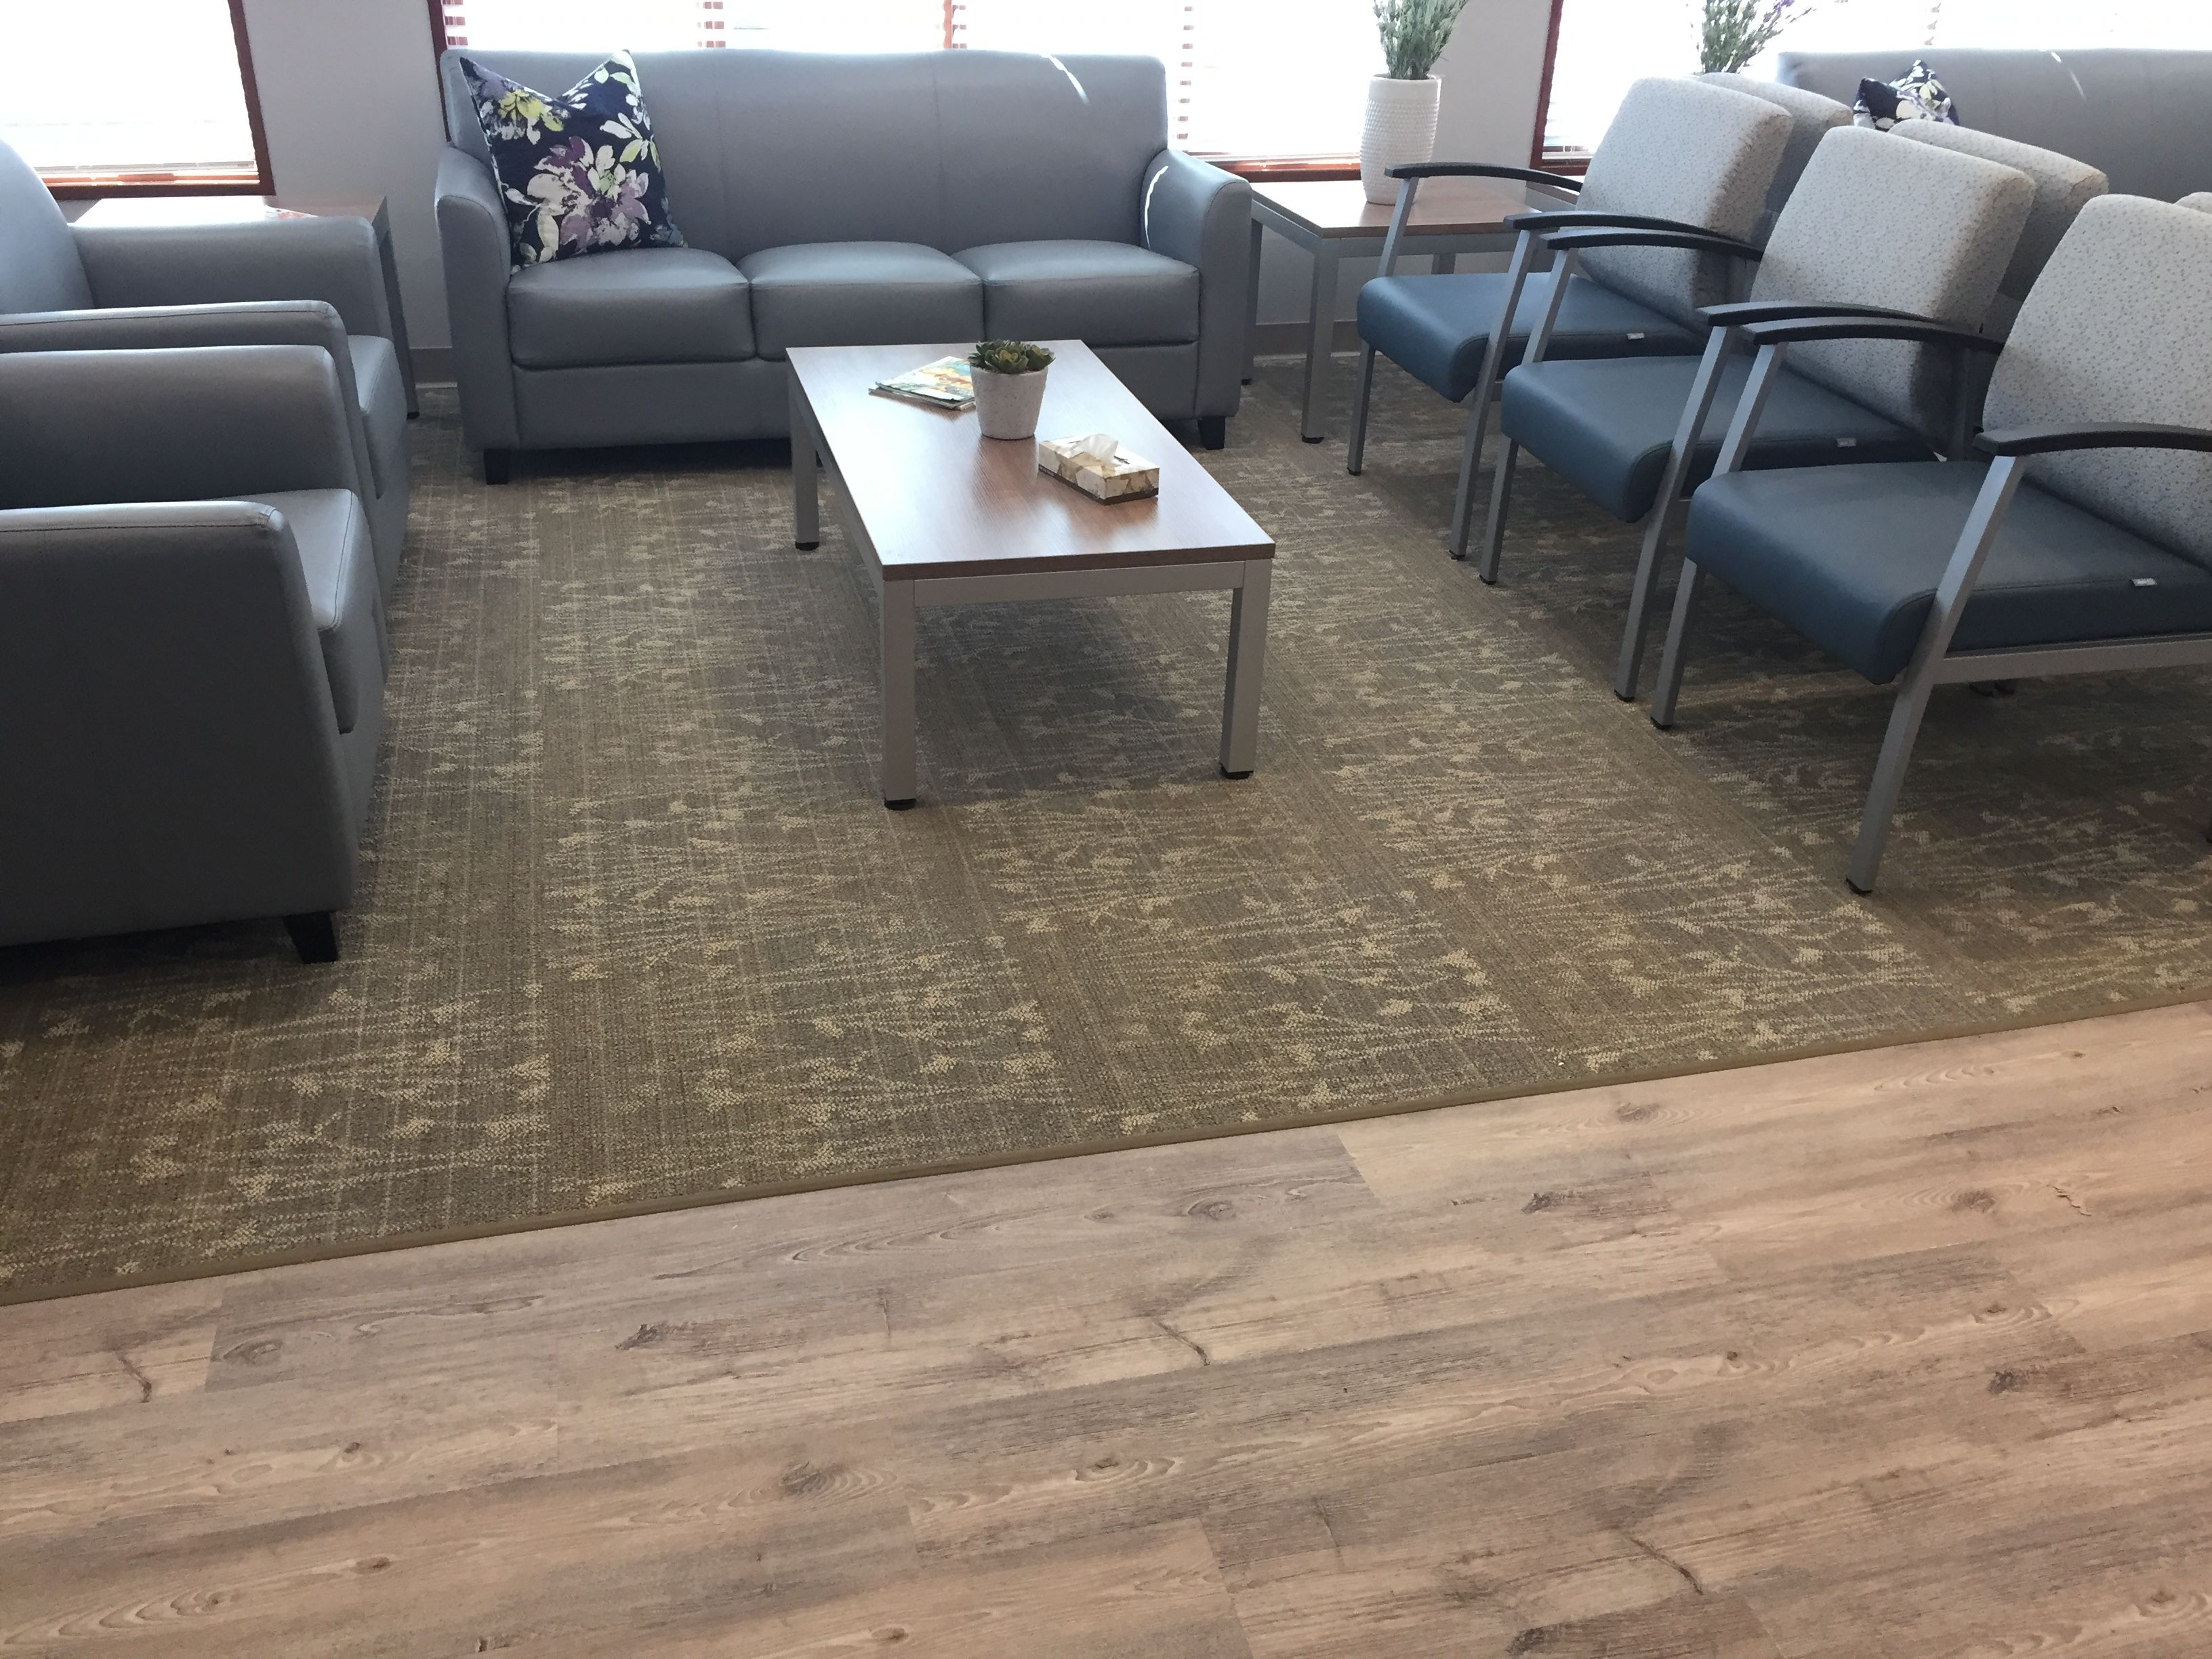 35+ Arlington heights health center address ideas in 2021